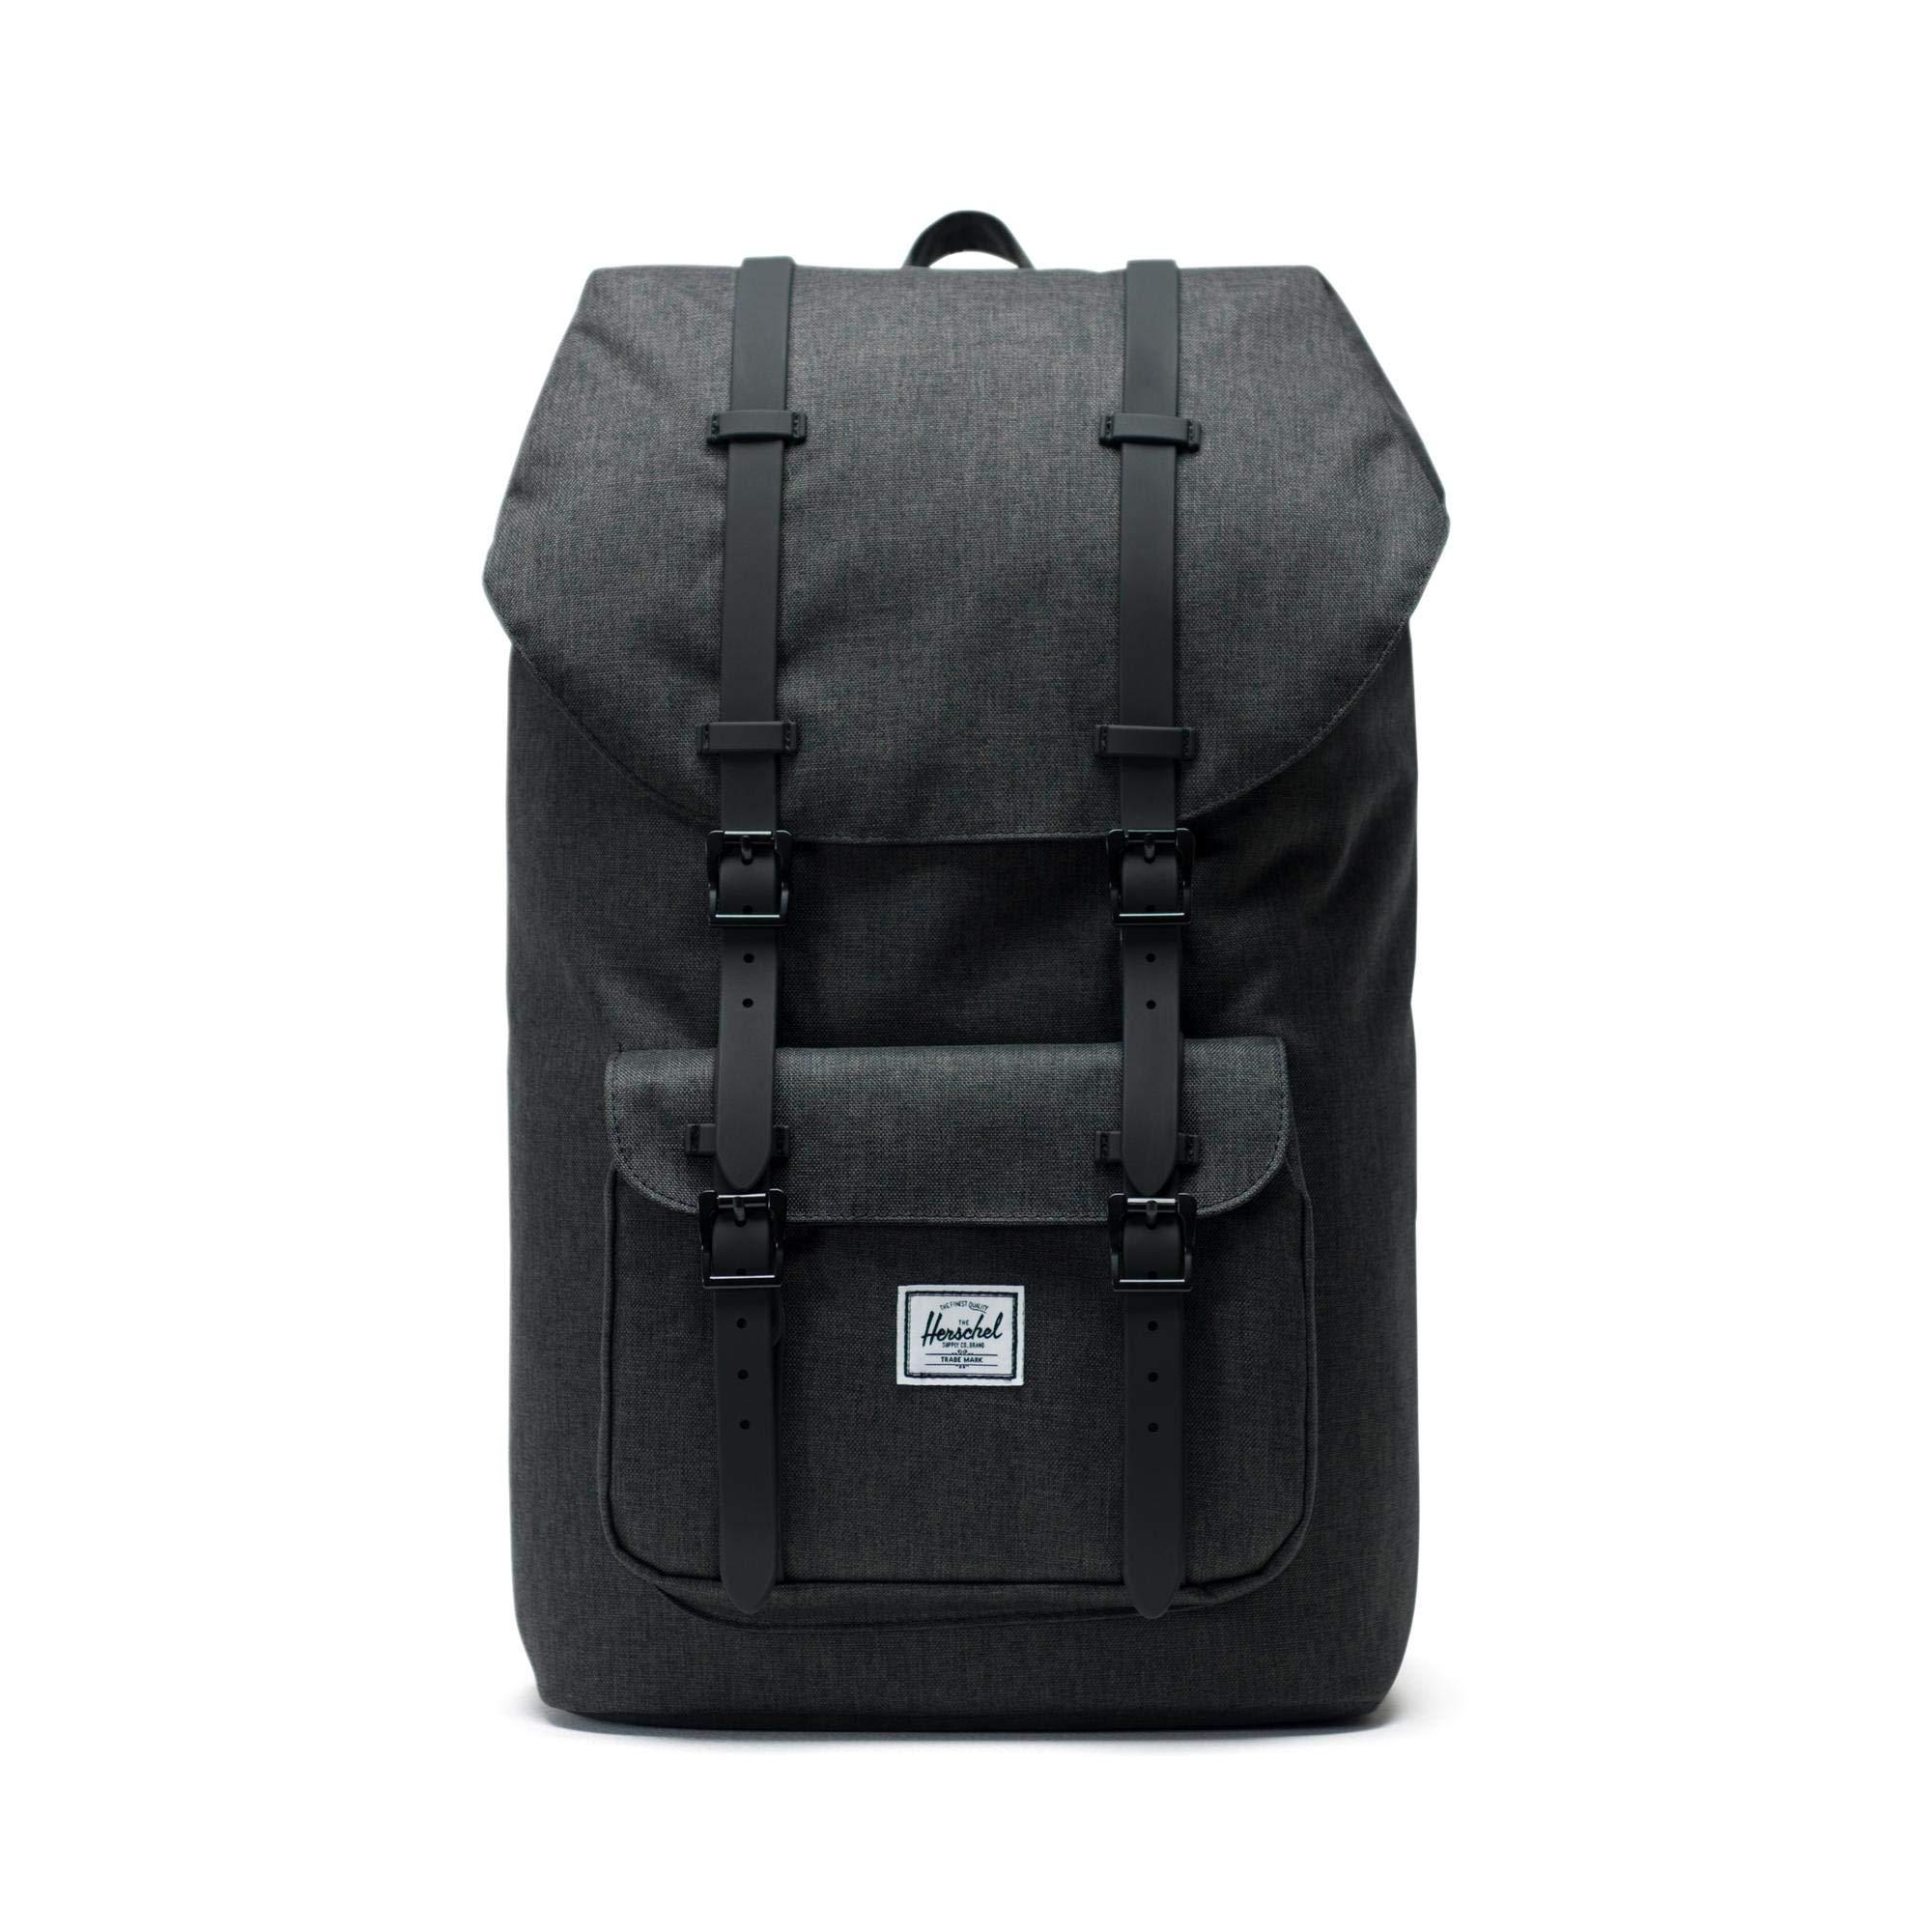 Herschel Little America Backpack Crosshatch/Black Rubber, One Size